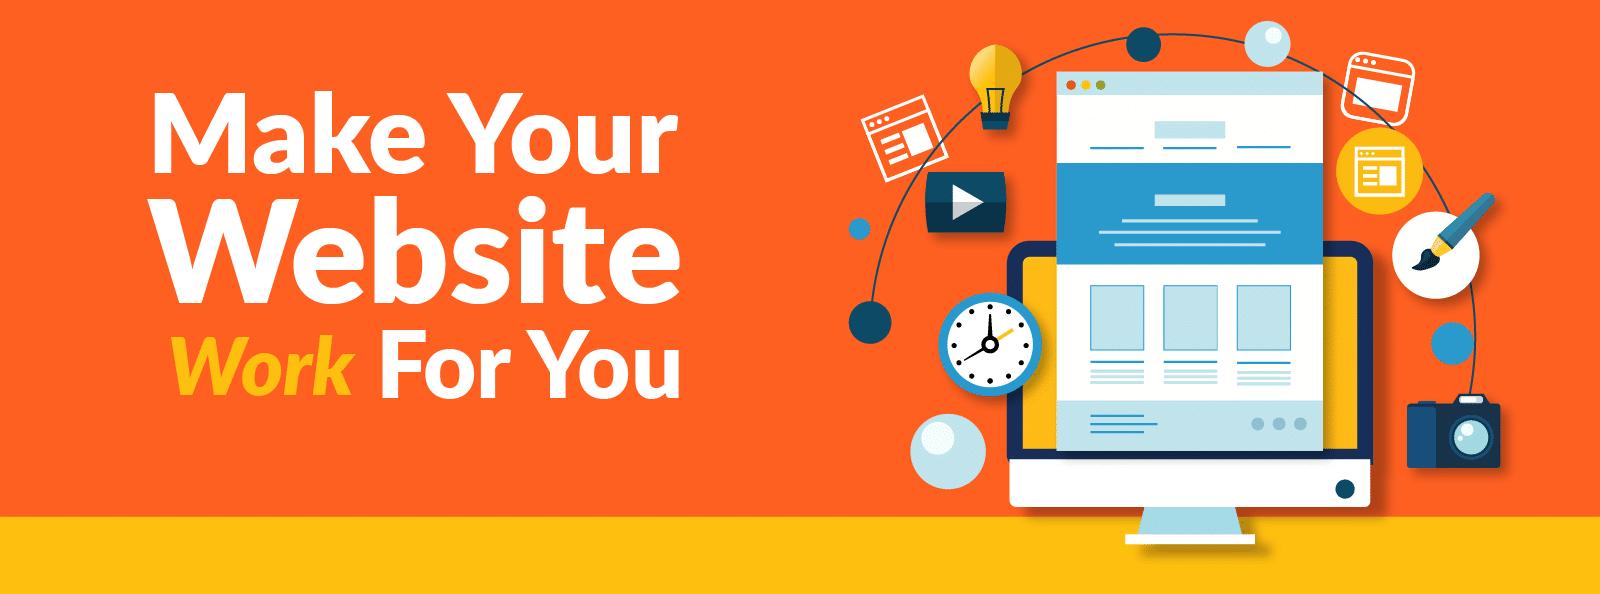 Make-Your-Website-Work-for-you-TrainingWebsite-1600x594